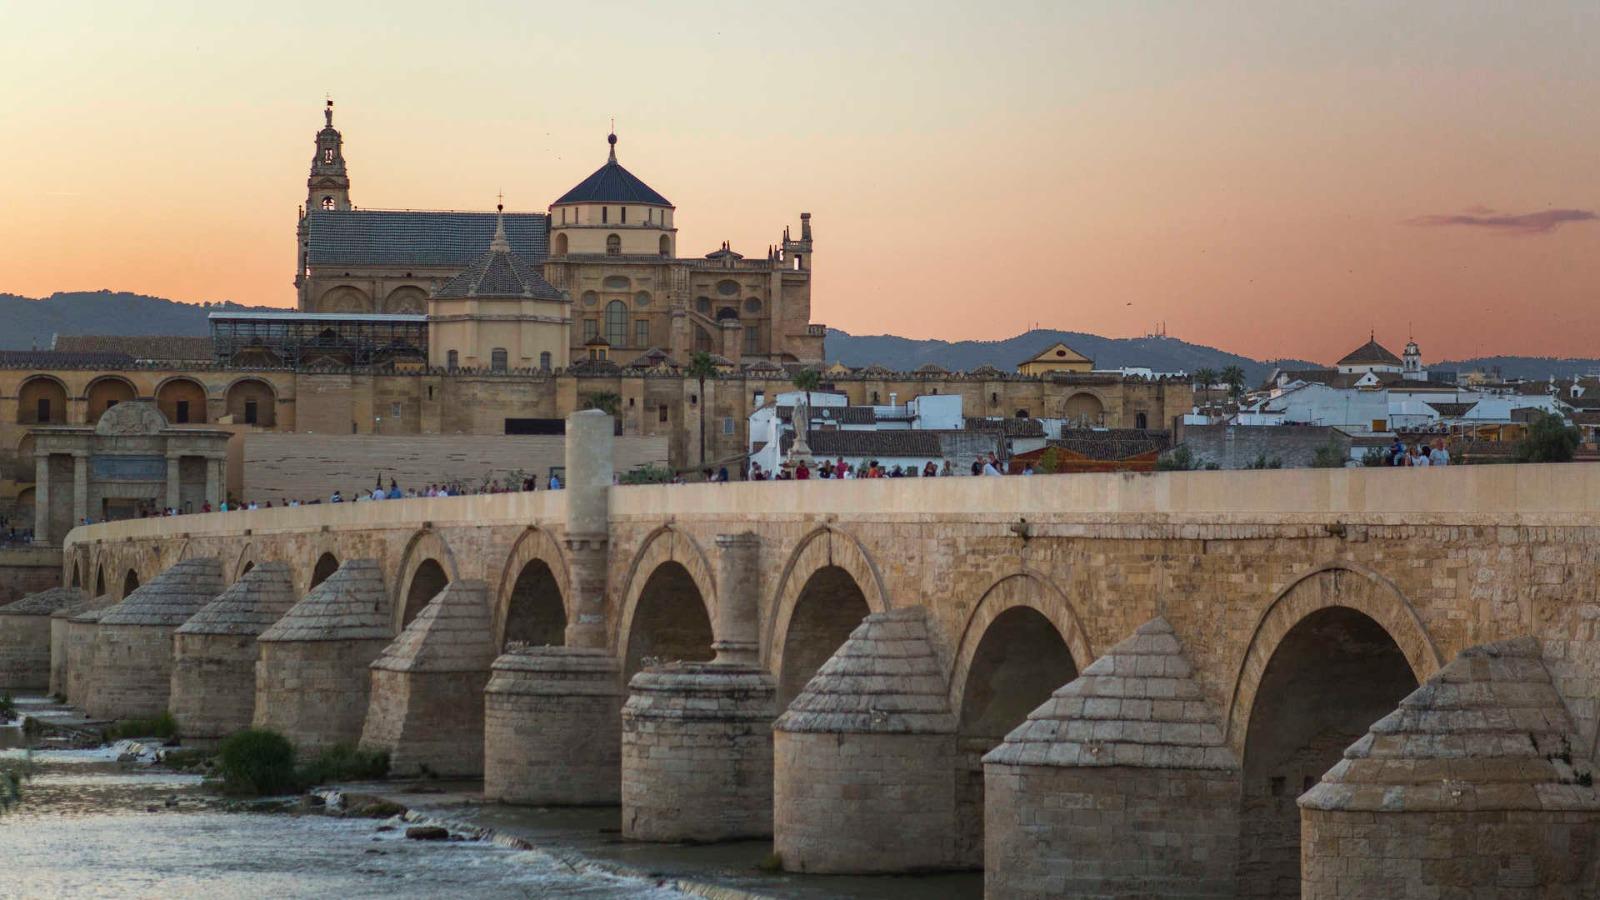 The Roman bridge of Córdoba